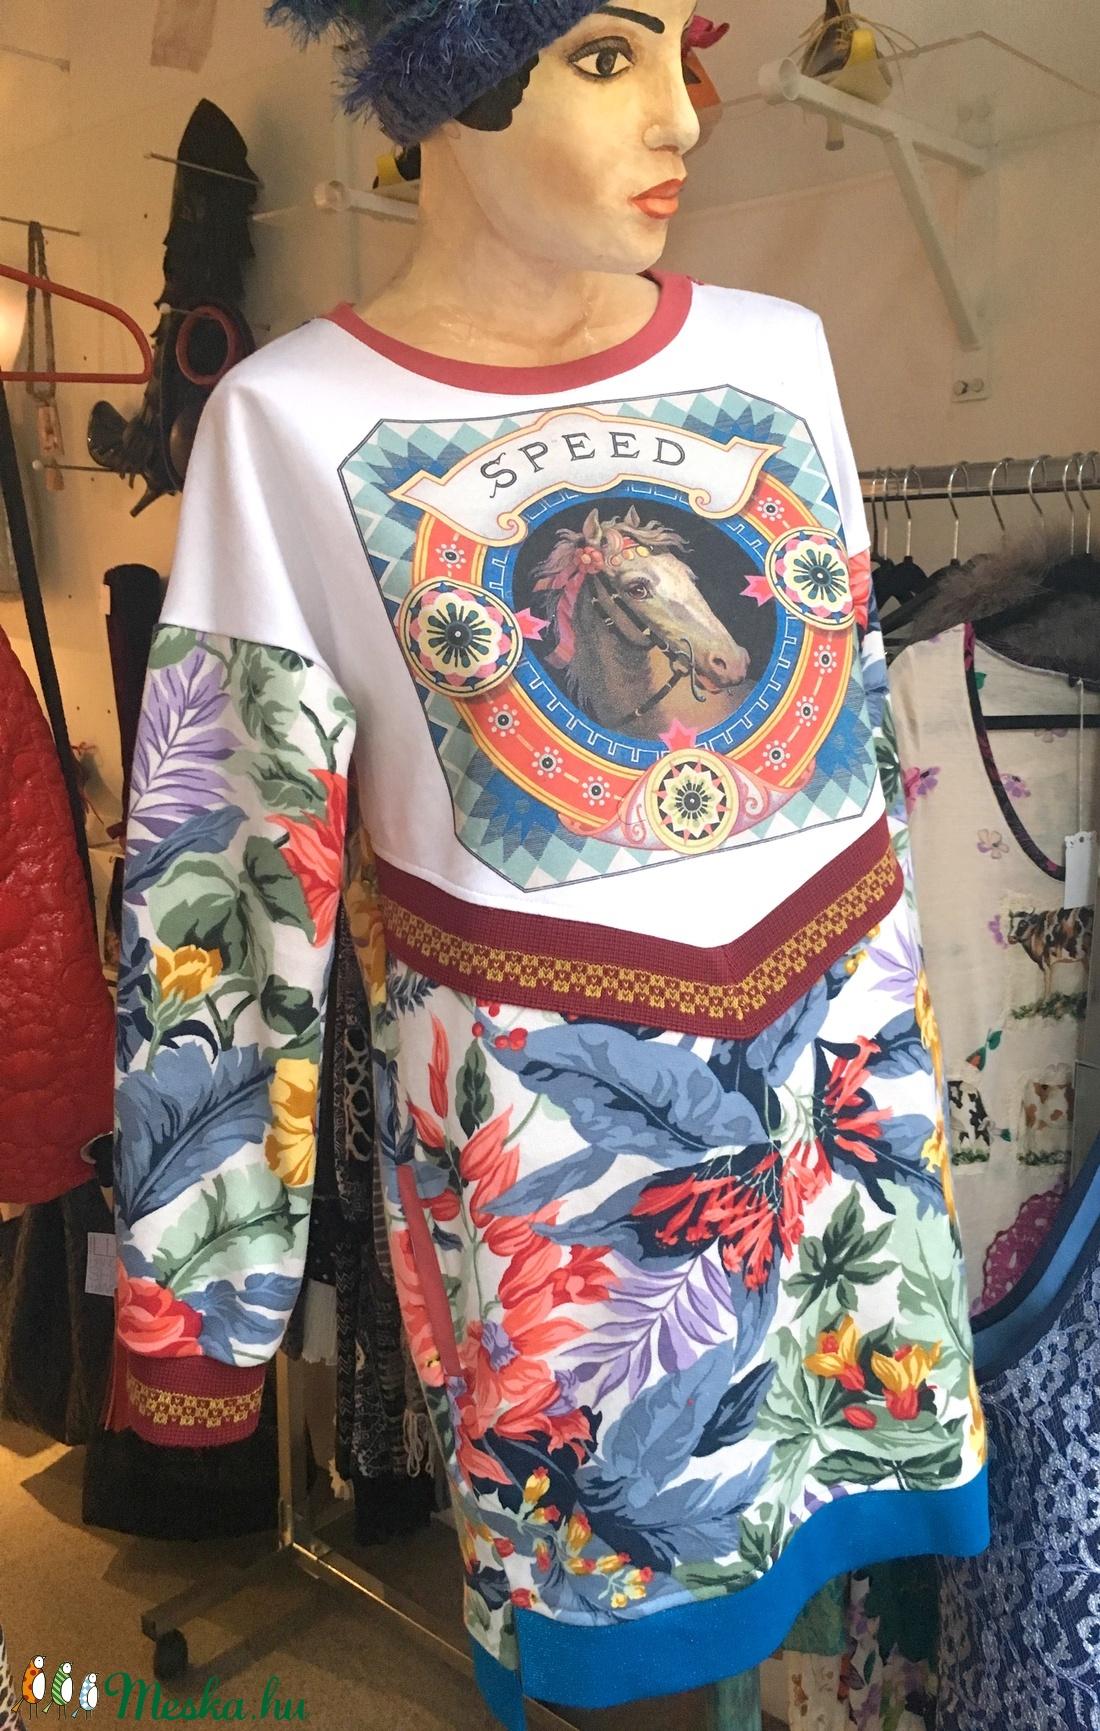 Lovas zsebes felső - ruha & divat - női ruha - ruha - Meska.hu